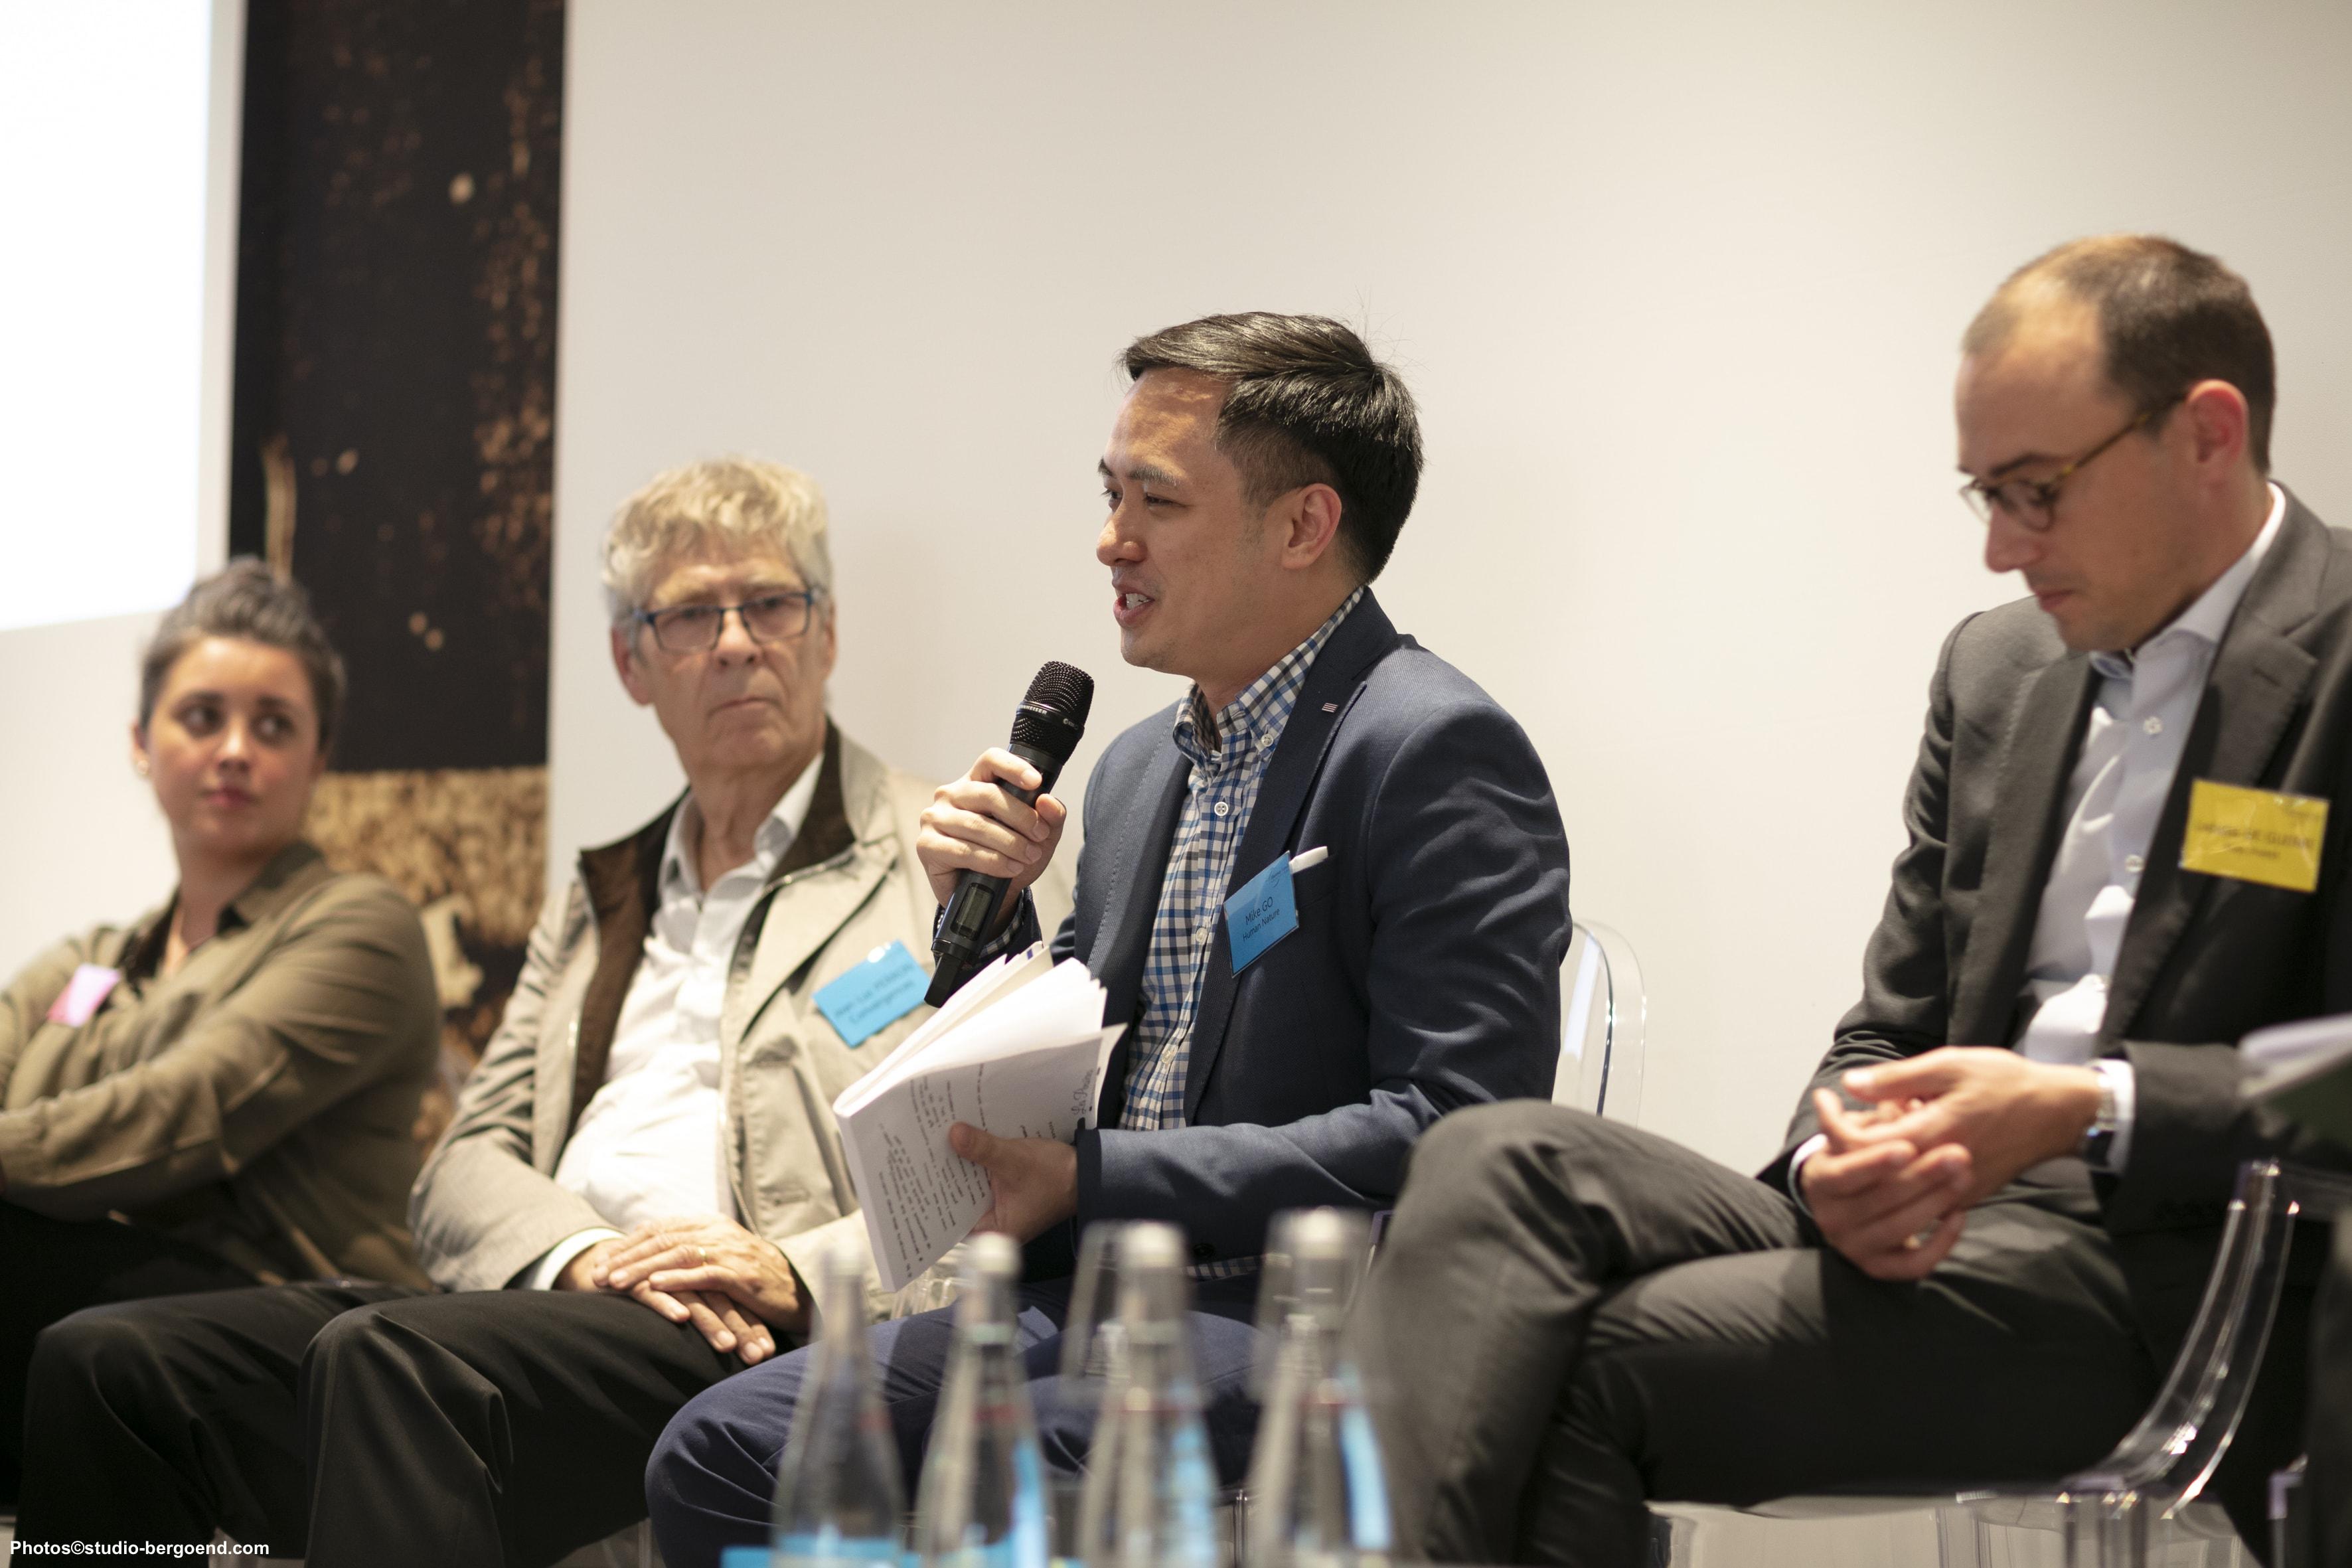 Jean-Luc Perron, Mike Go and Ladislas de Guerre